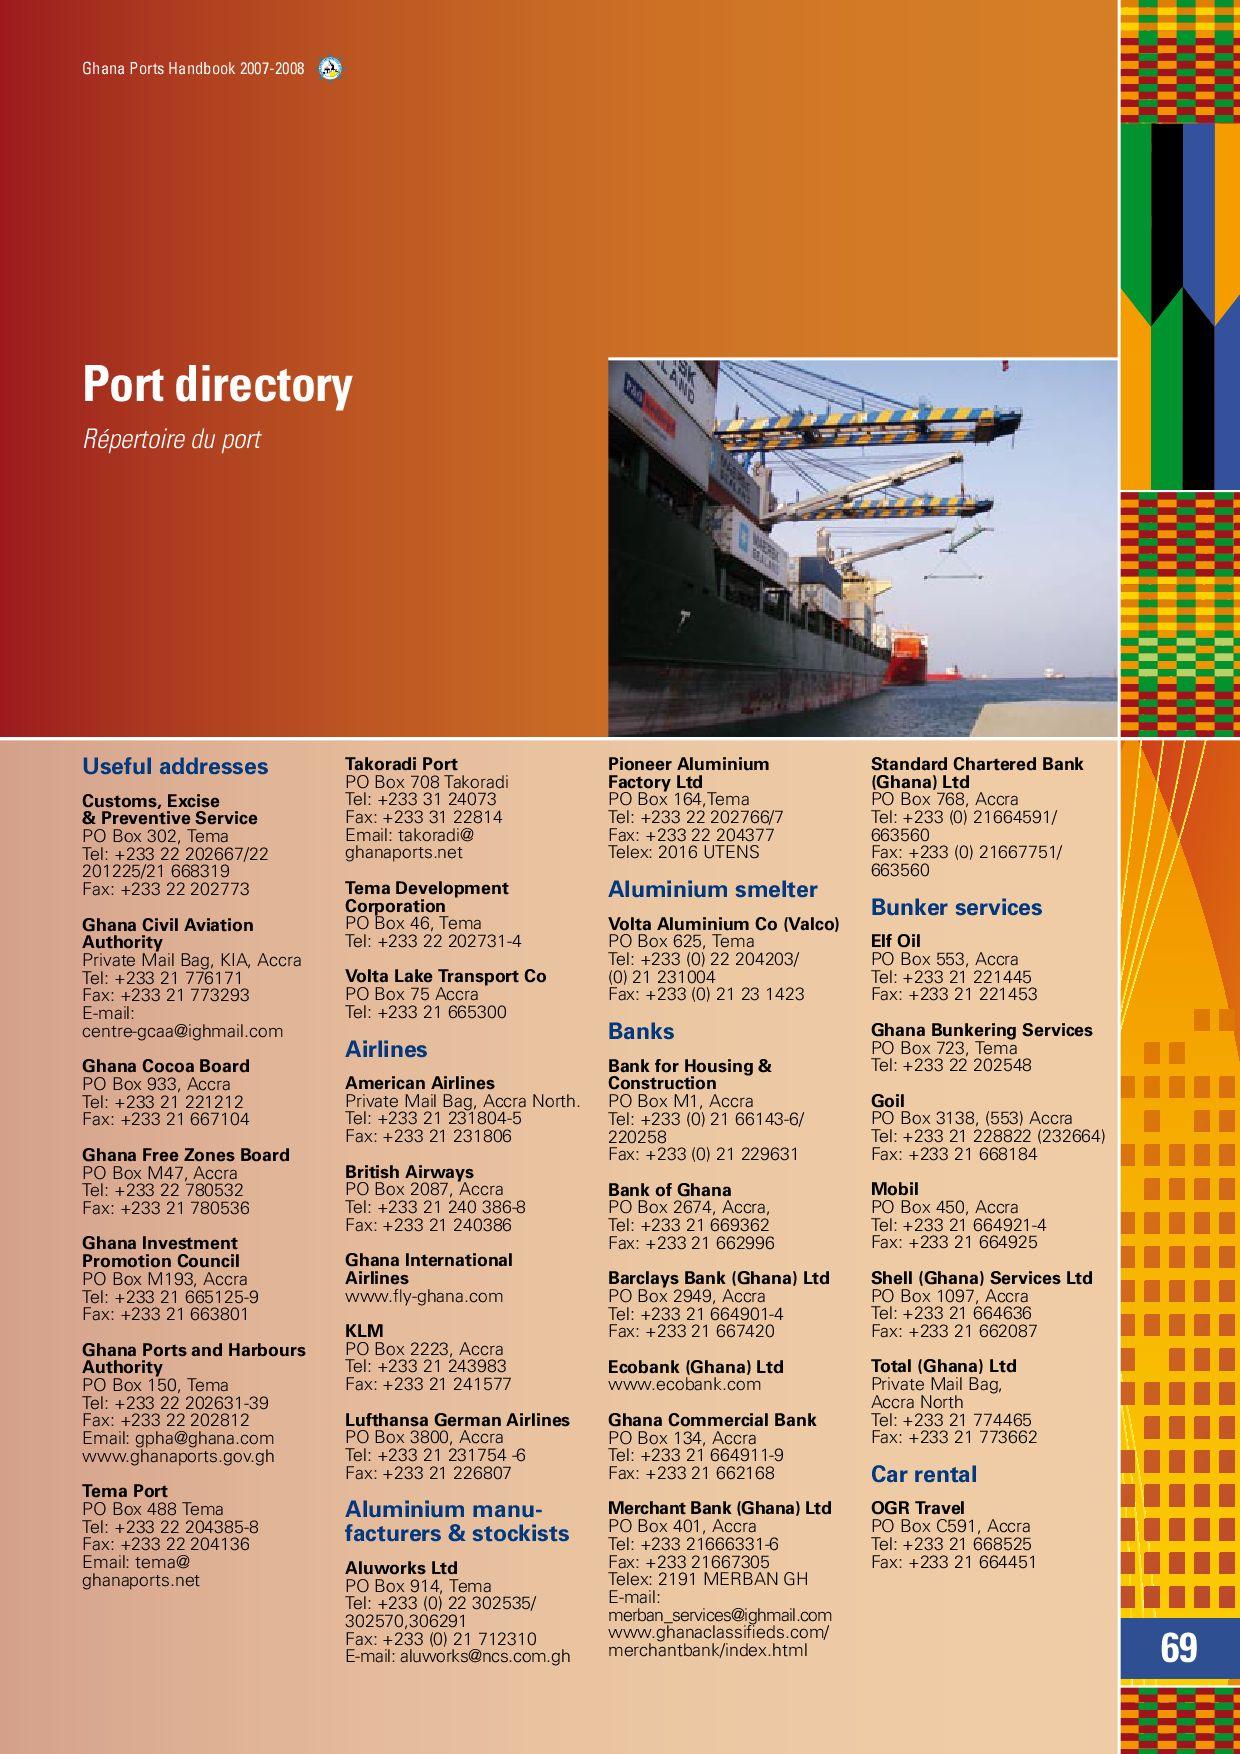 Ghana Ports Handbook 2007-2008 by Land & Marine Publications